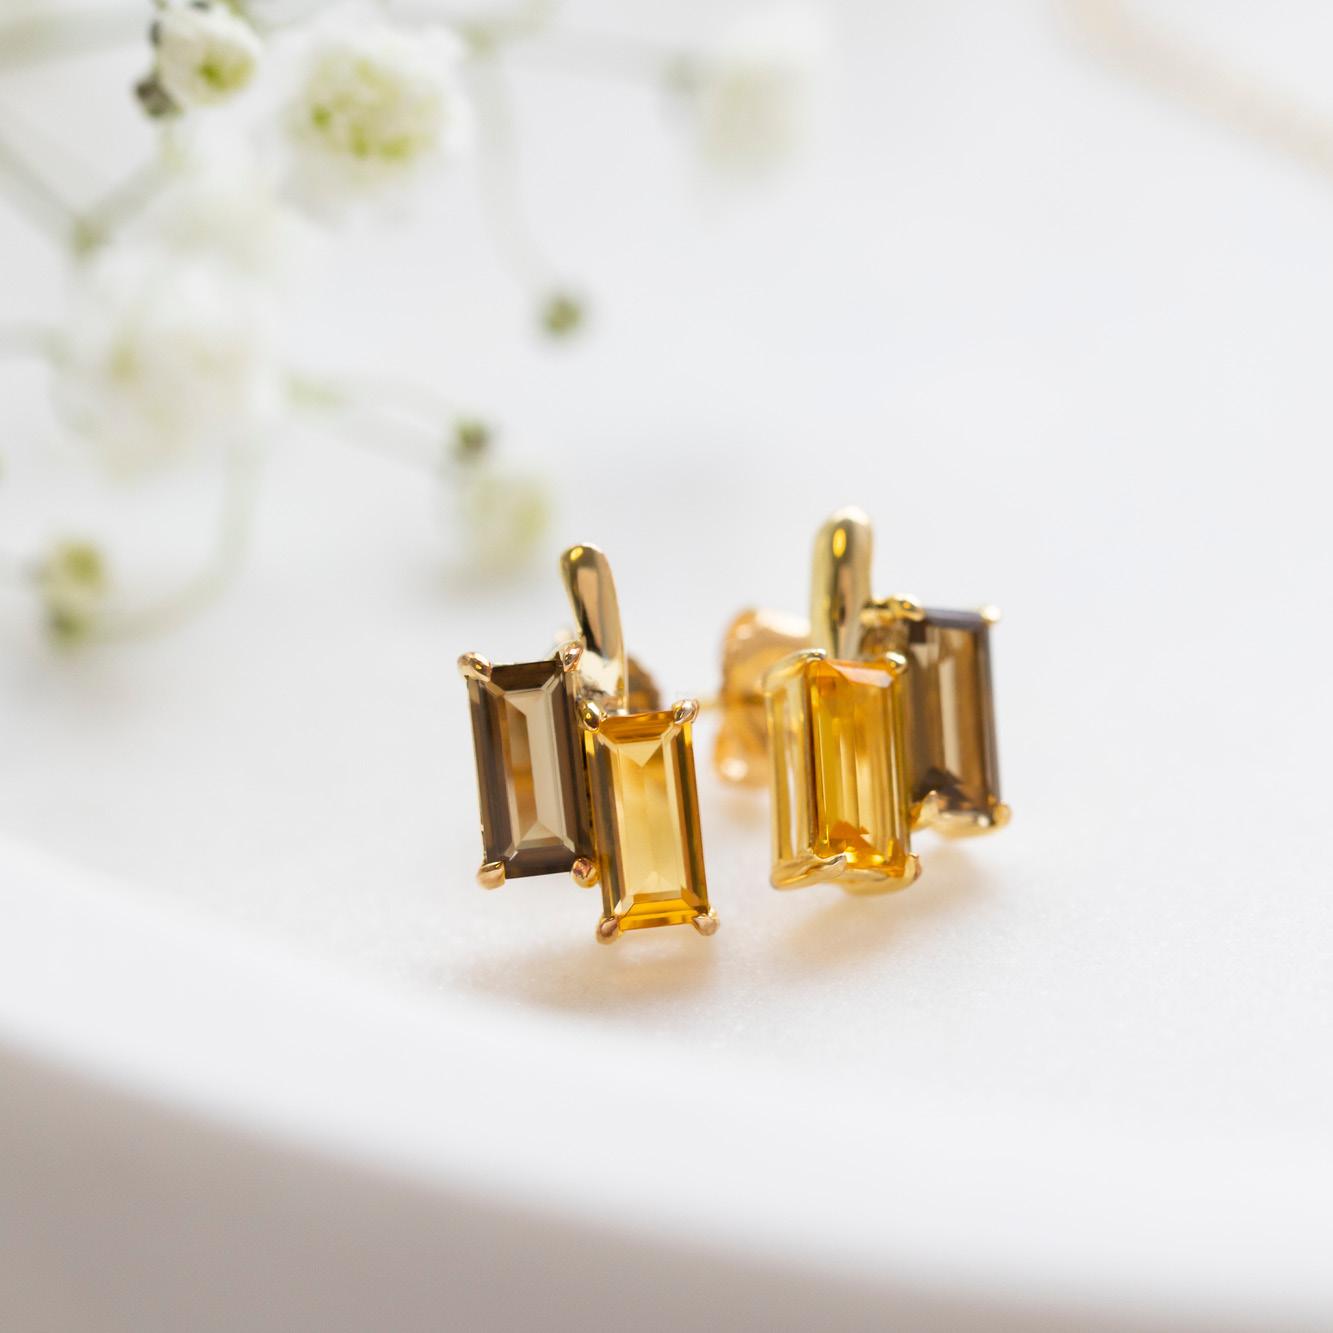 Damen Ohrstecker Silber 925 Vergoldet Citrin Quarz